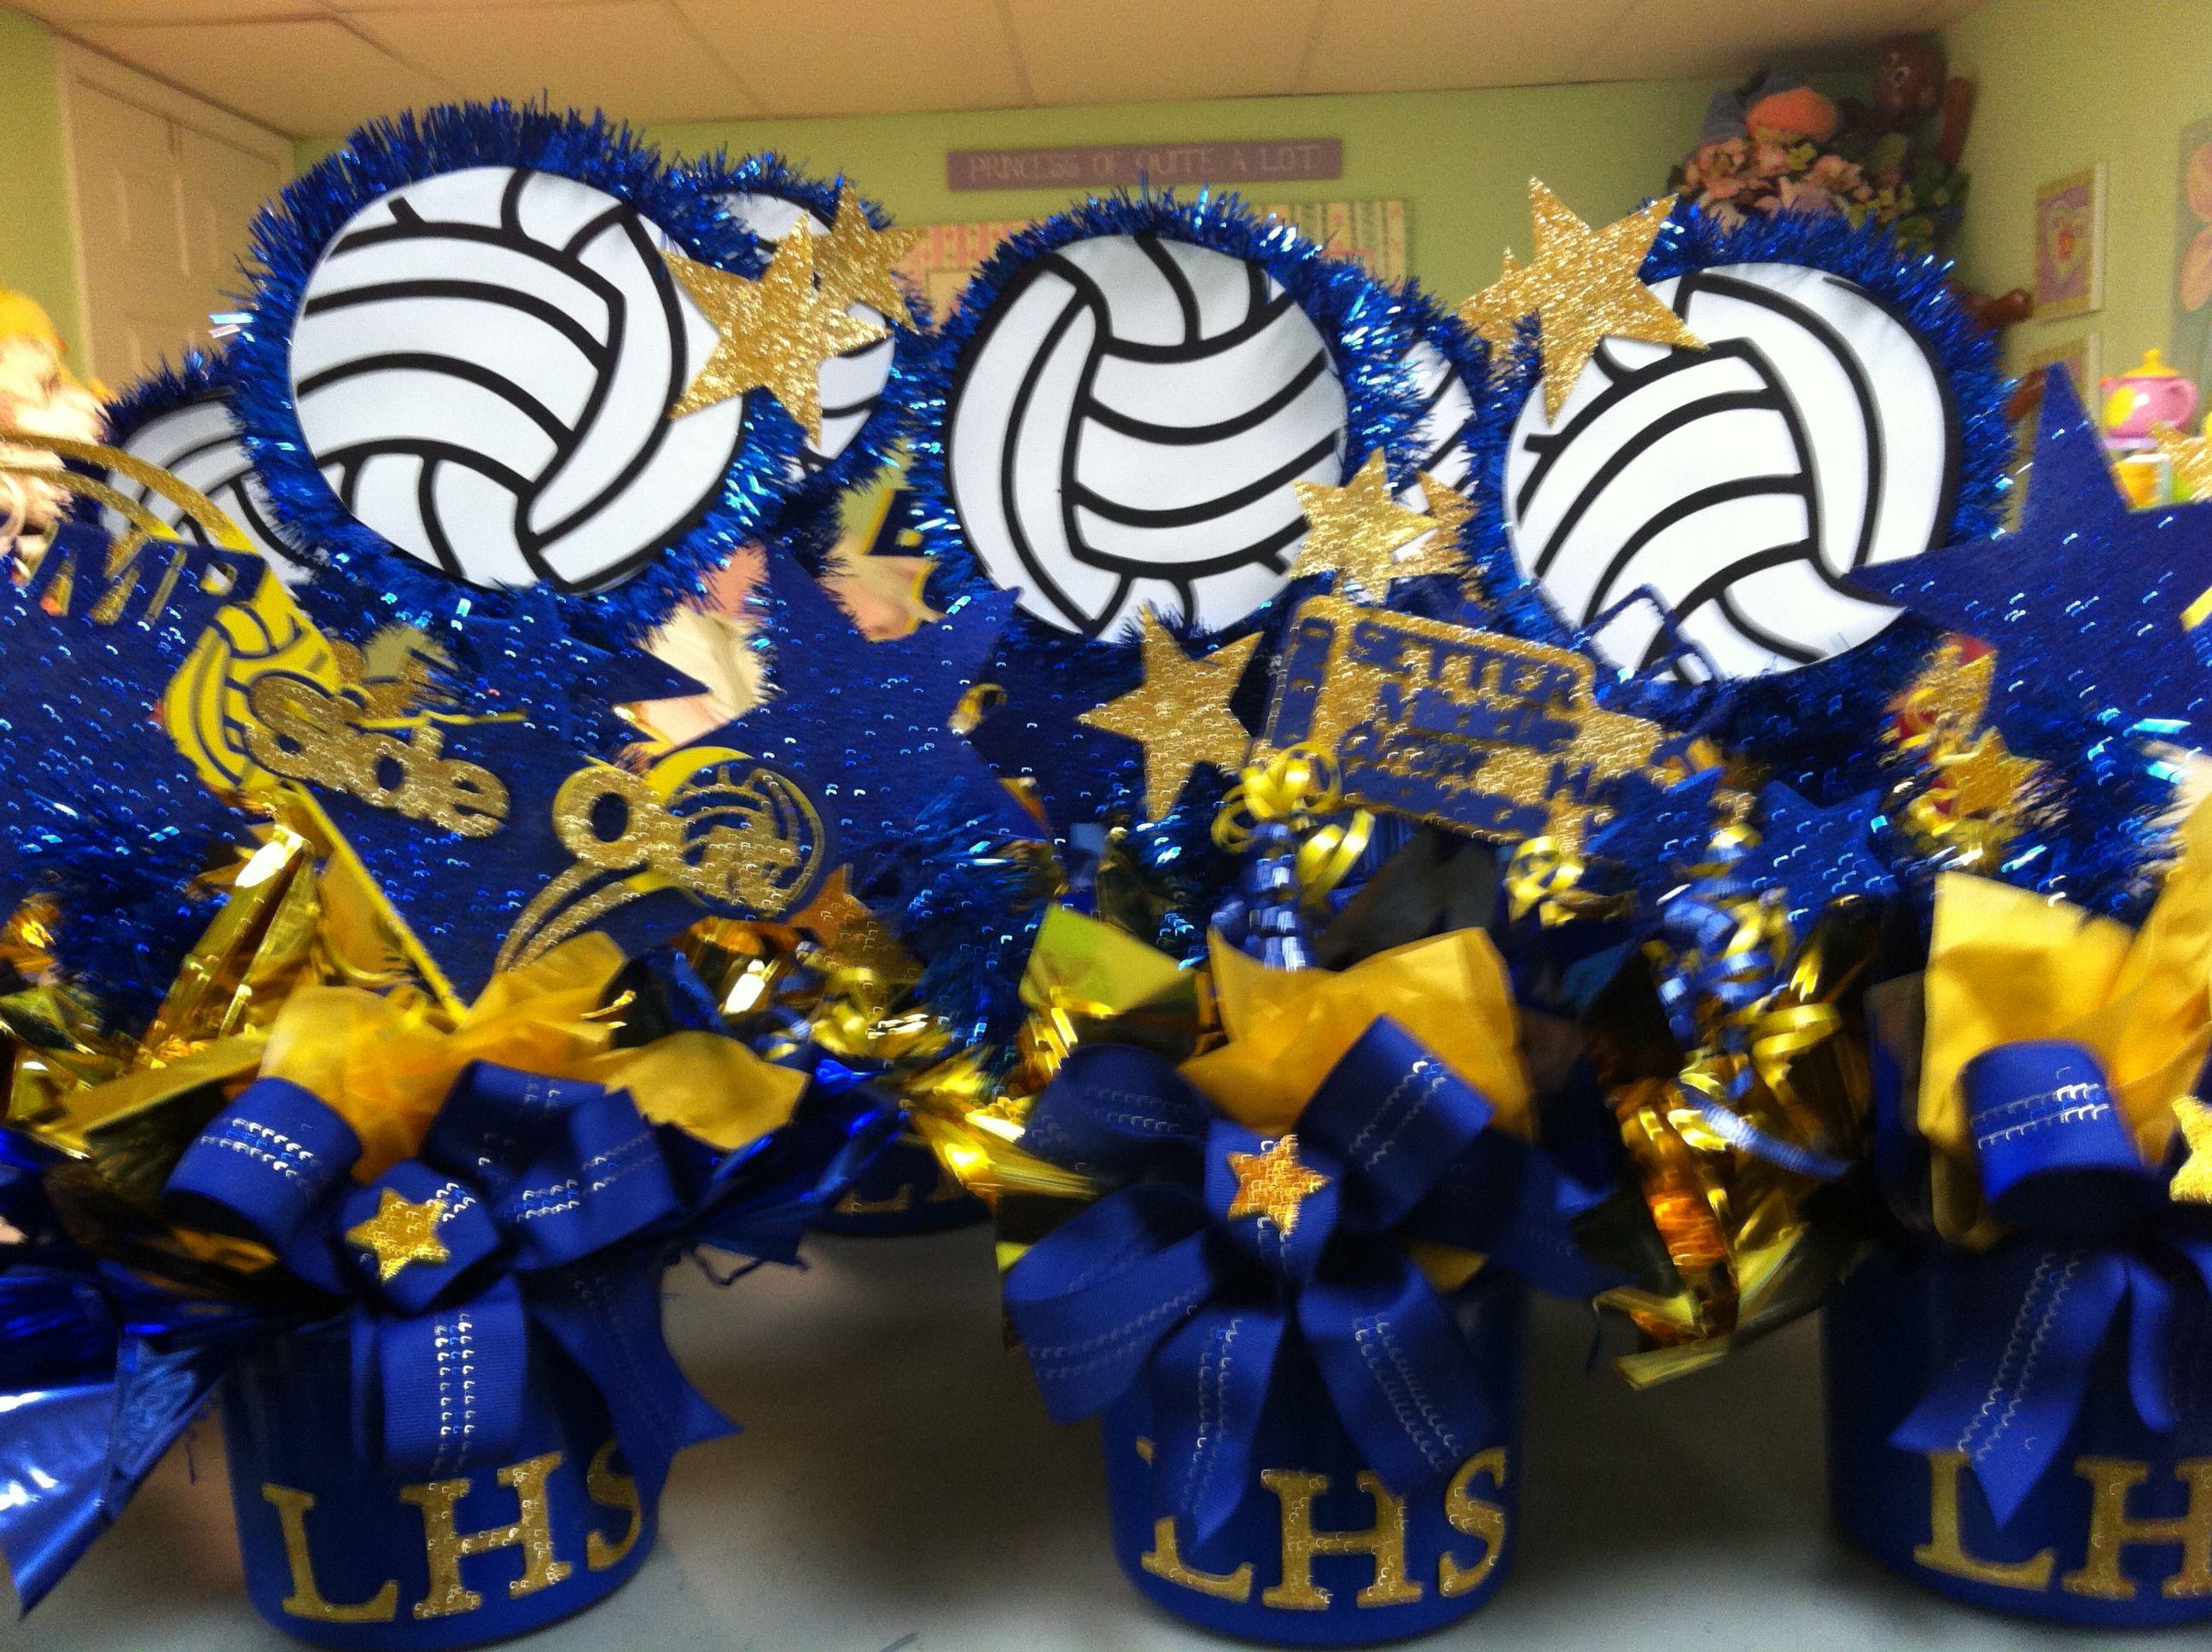 Volleyball Banquet Centerpieces Sports Fun Volleyball